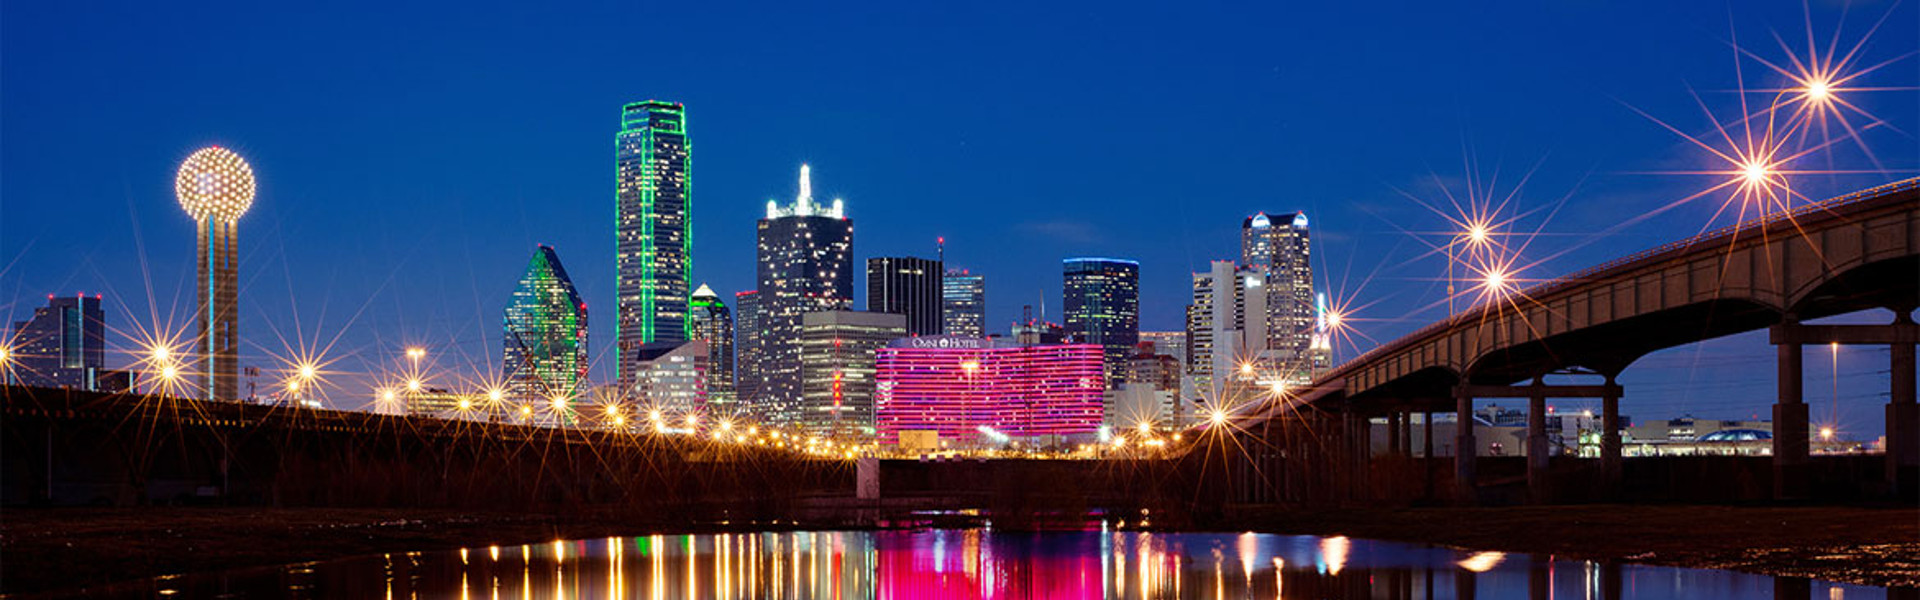 Omni Dallas Hotel and Skyline Across Creek